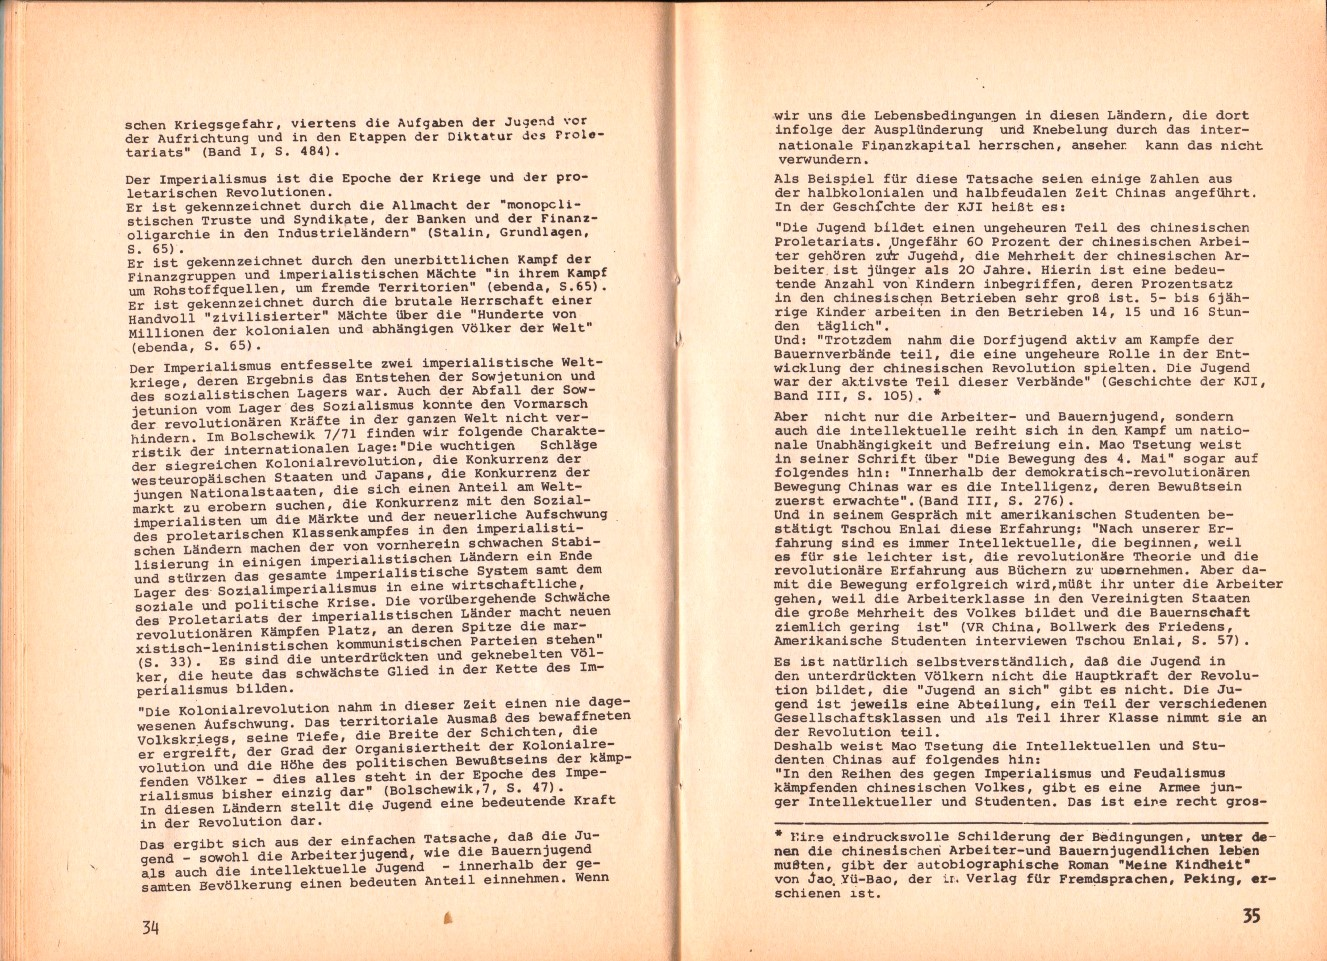 ZB_Parteiarbeiter_1971_10_19